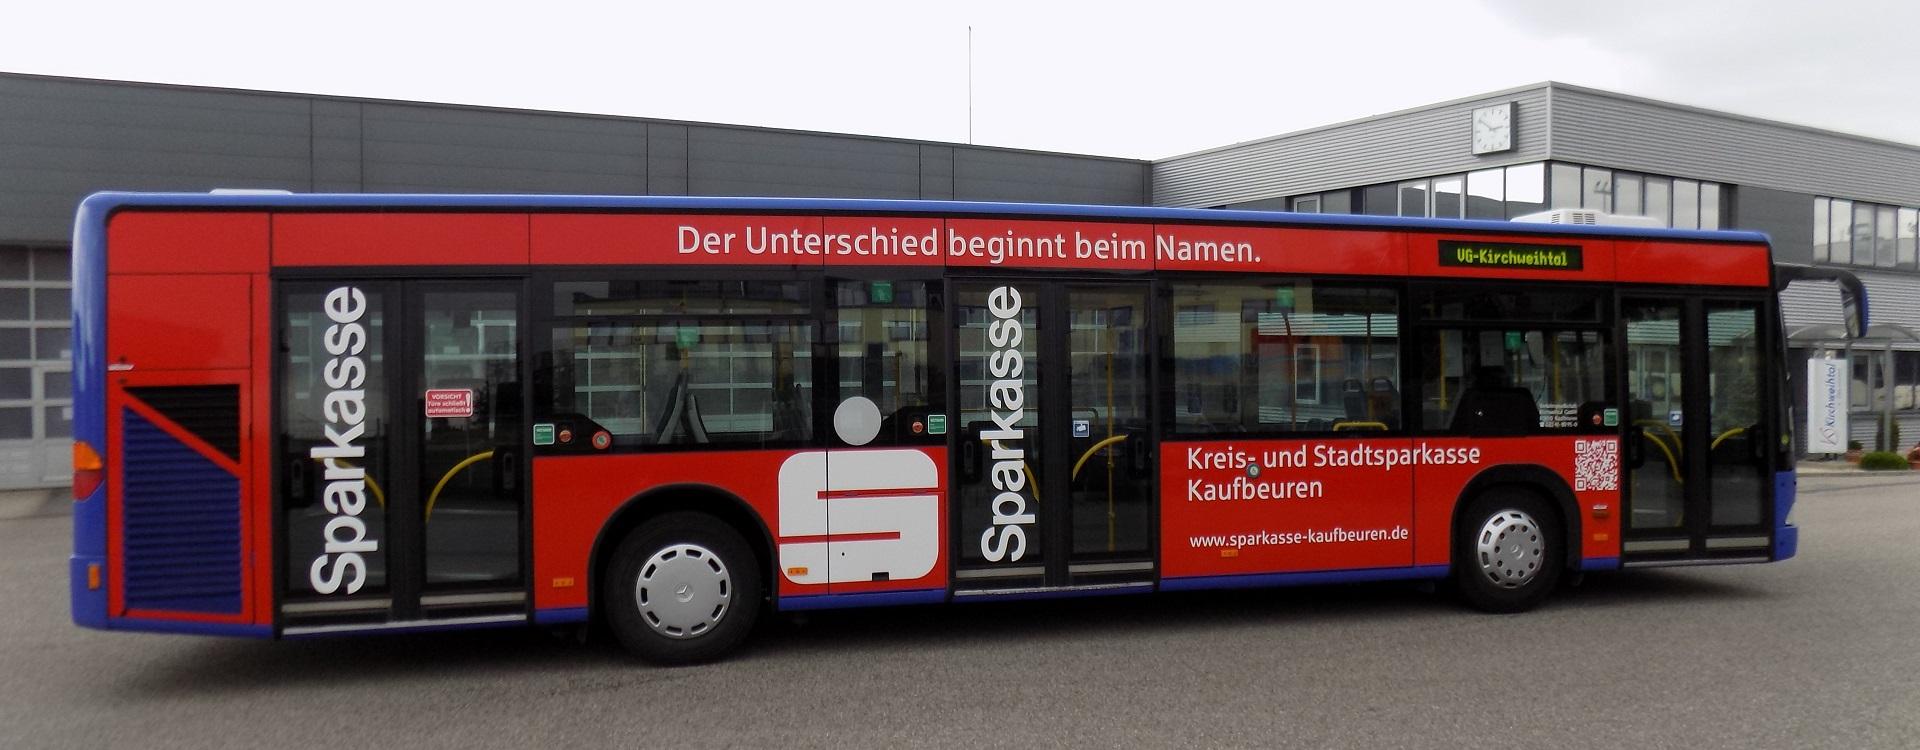 kirchweihtal_werbung01